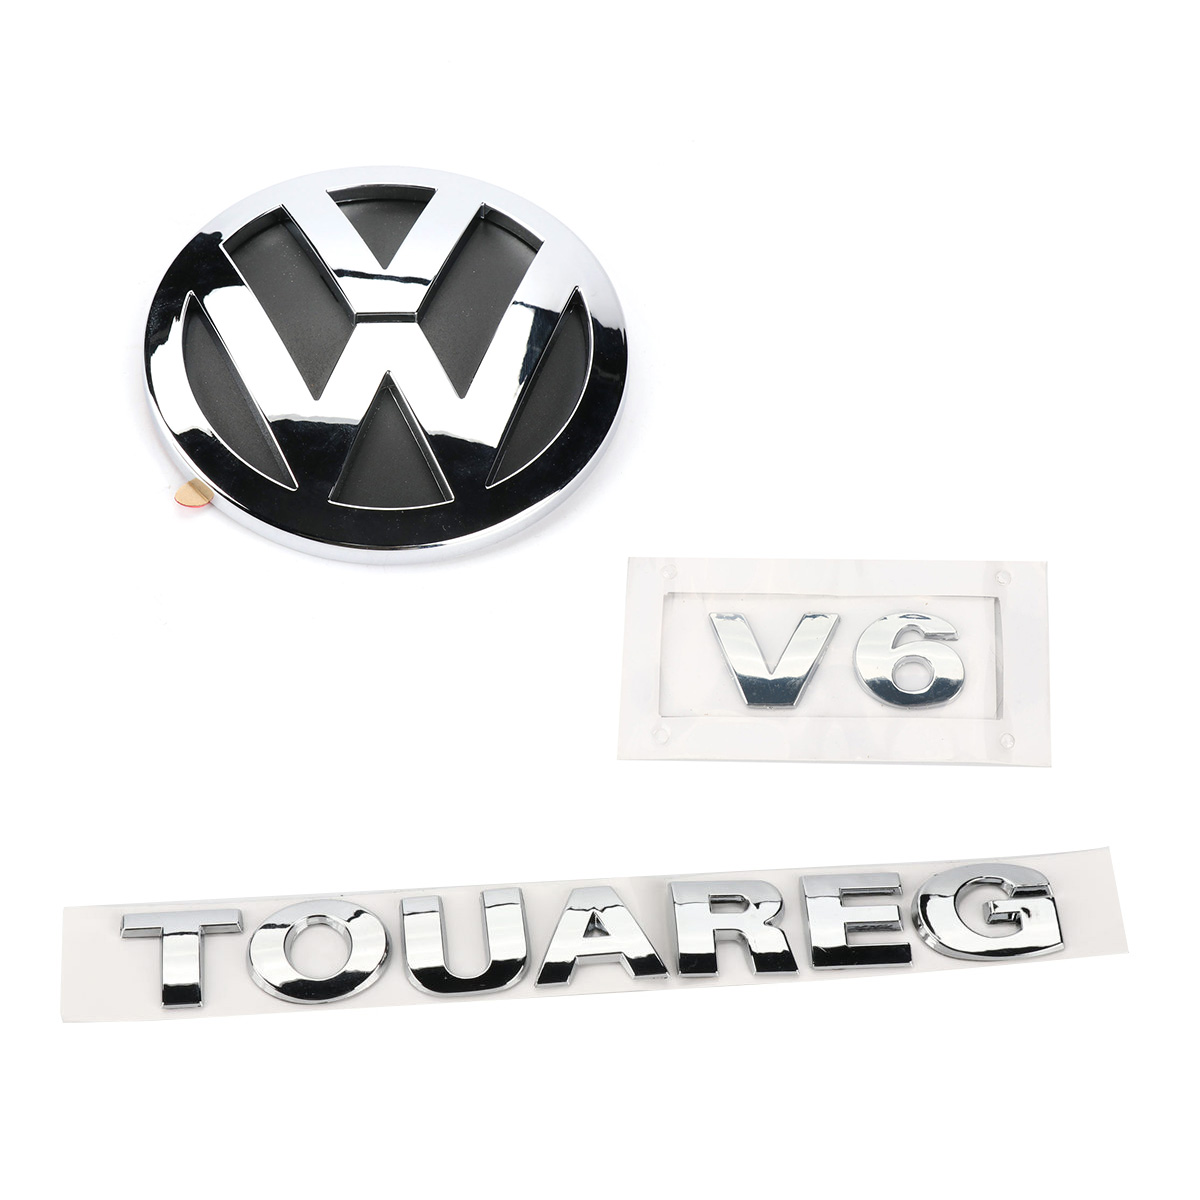 Nueva insignia trasera Boot Chrome emblema V6 TOUAREG 3 piezas para VW Sharan 2011-2016 Touareg 2011-2014 7P6 853 630 un